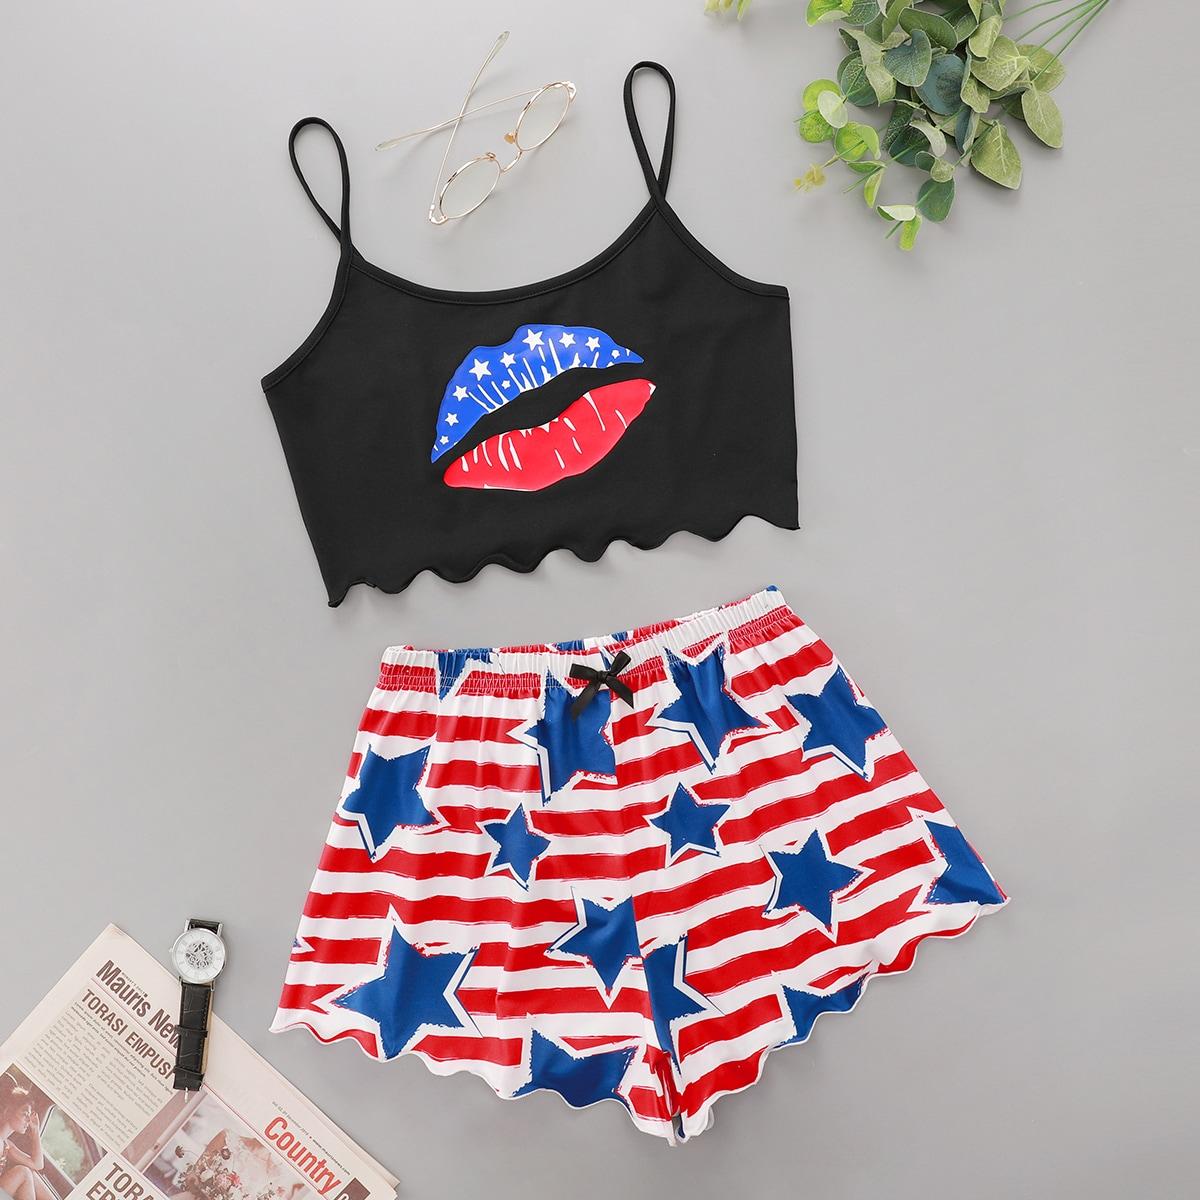 SHEIN / Star And Lip Print Scallop Trim Cami Pajama Set